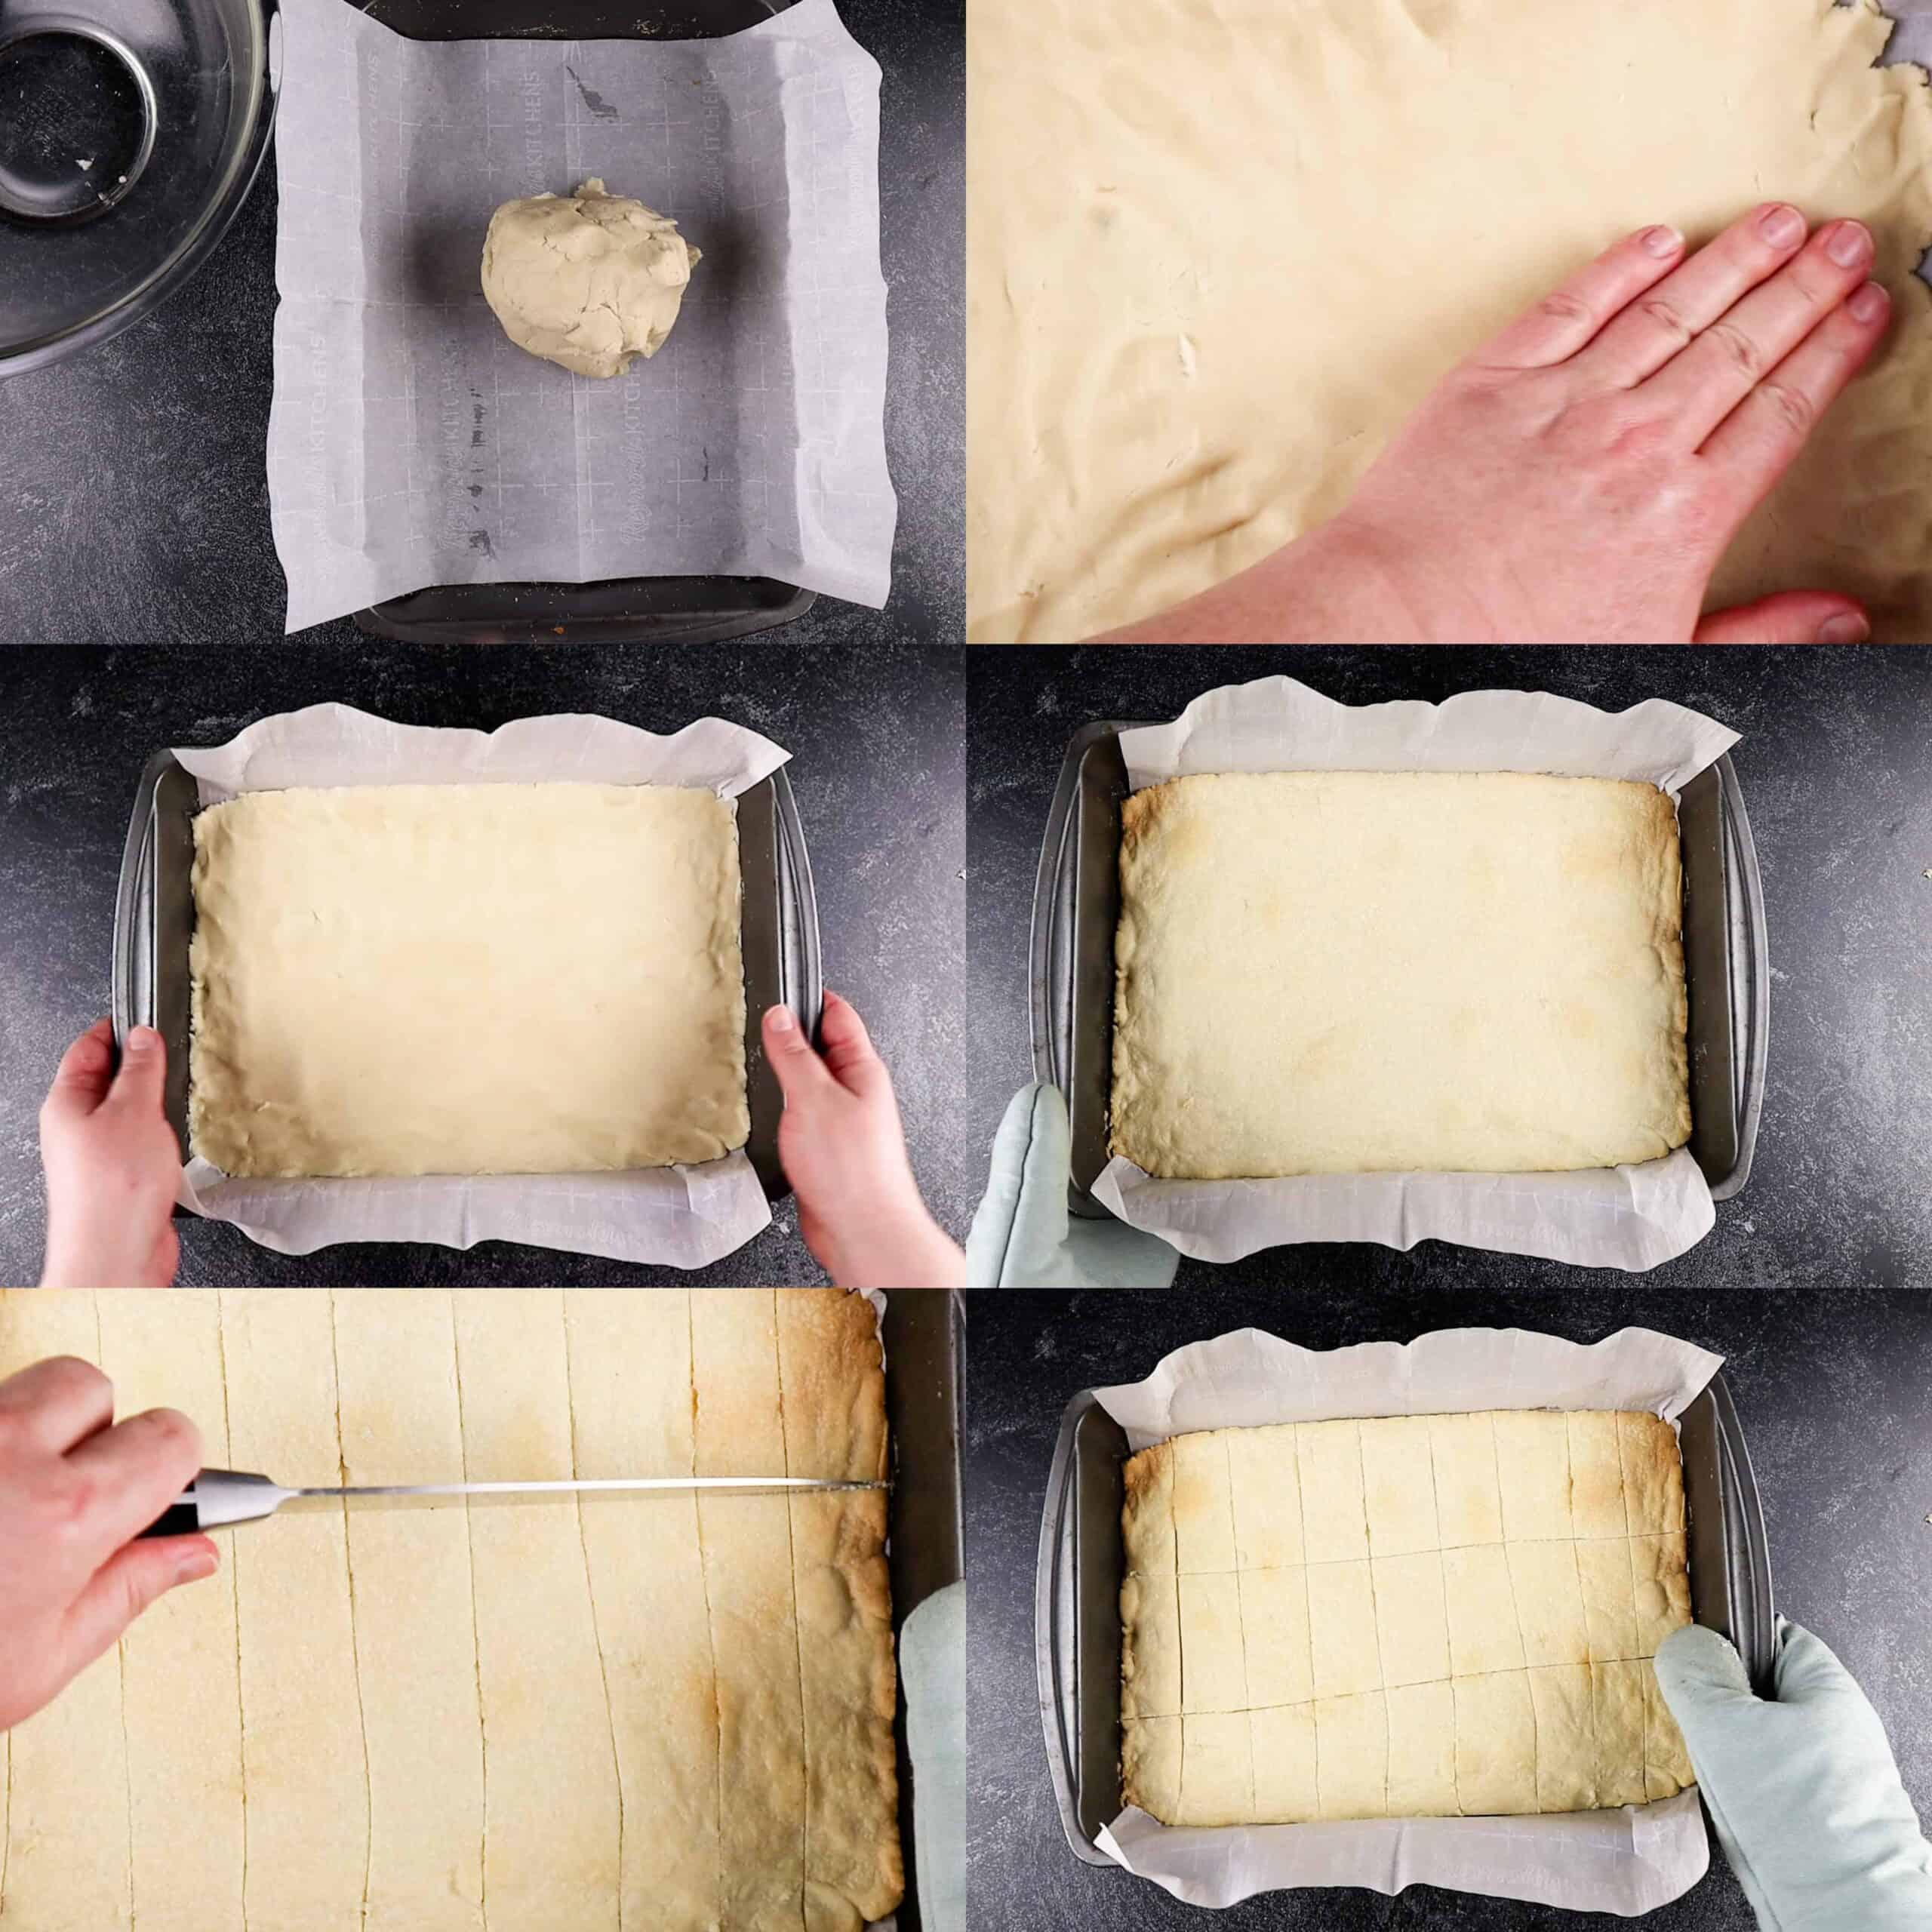 Putting dough in baking dish and baking process shots